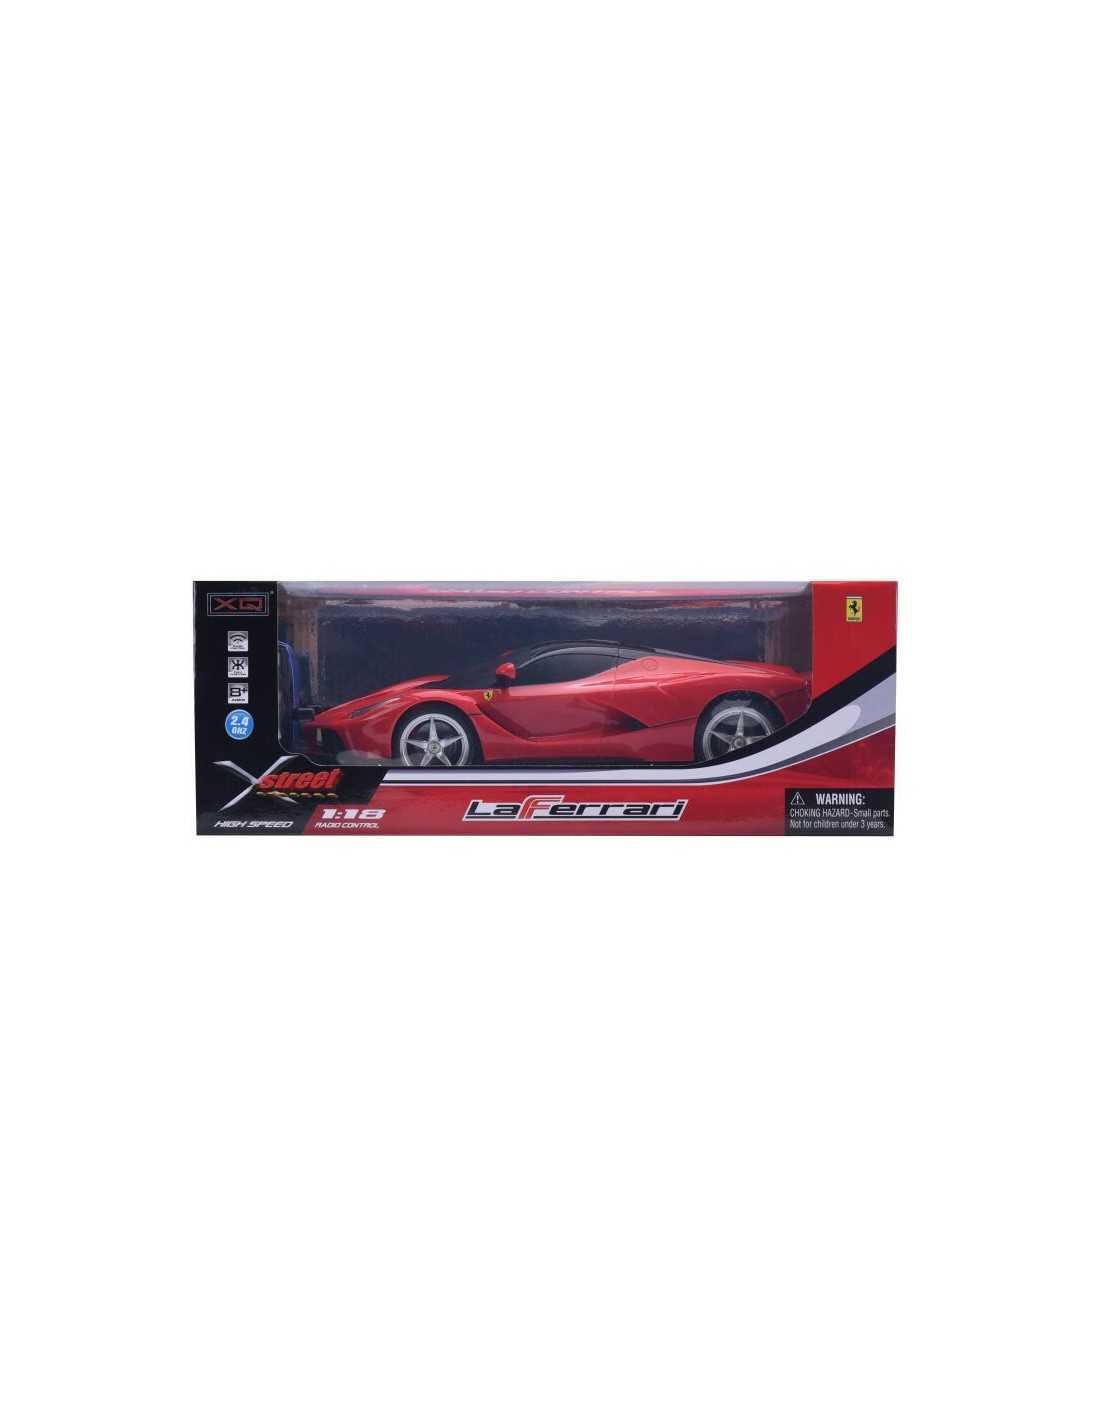 La Ferrari radiocomando scala 1:18